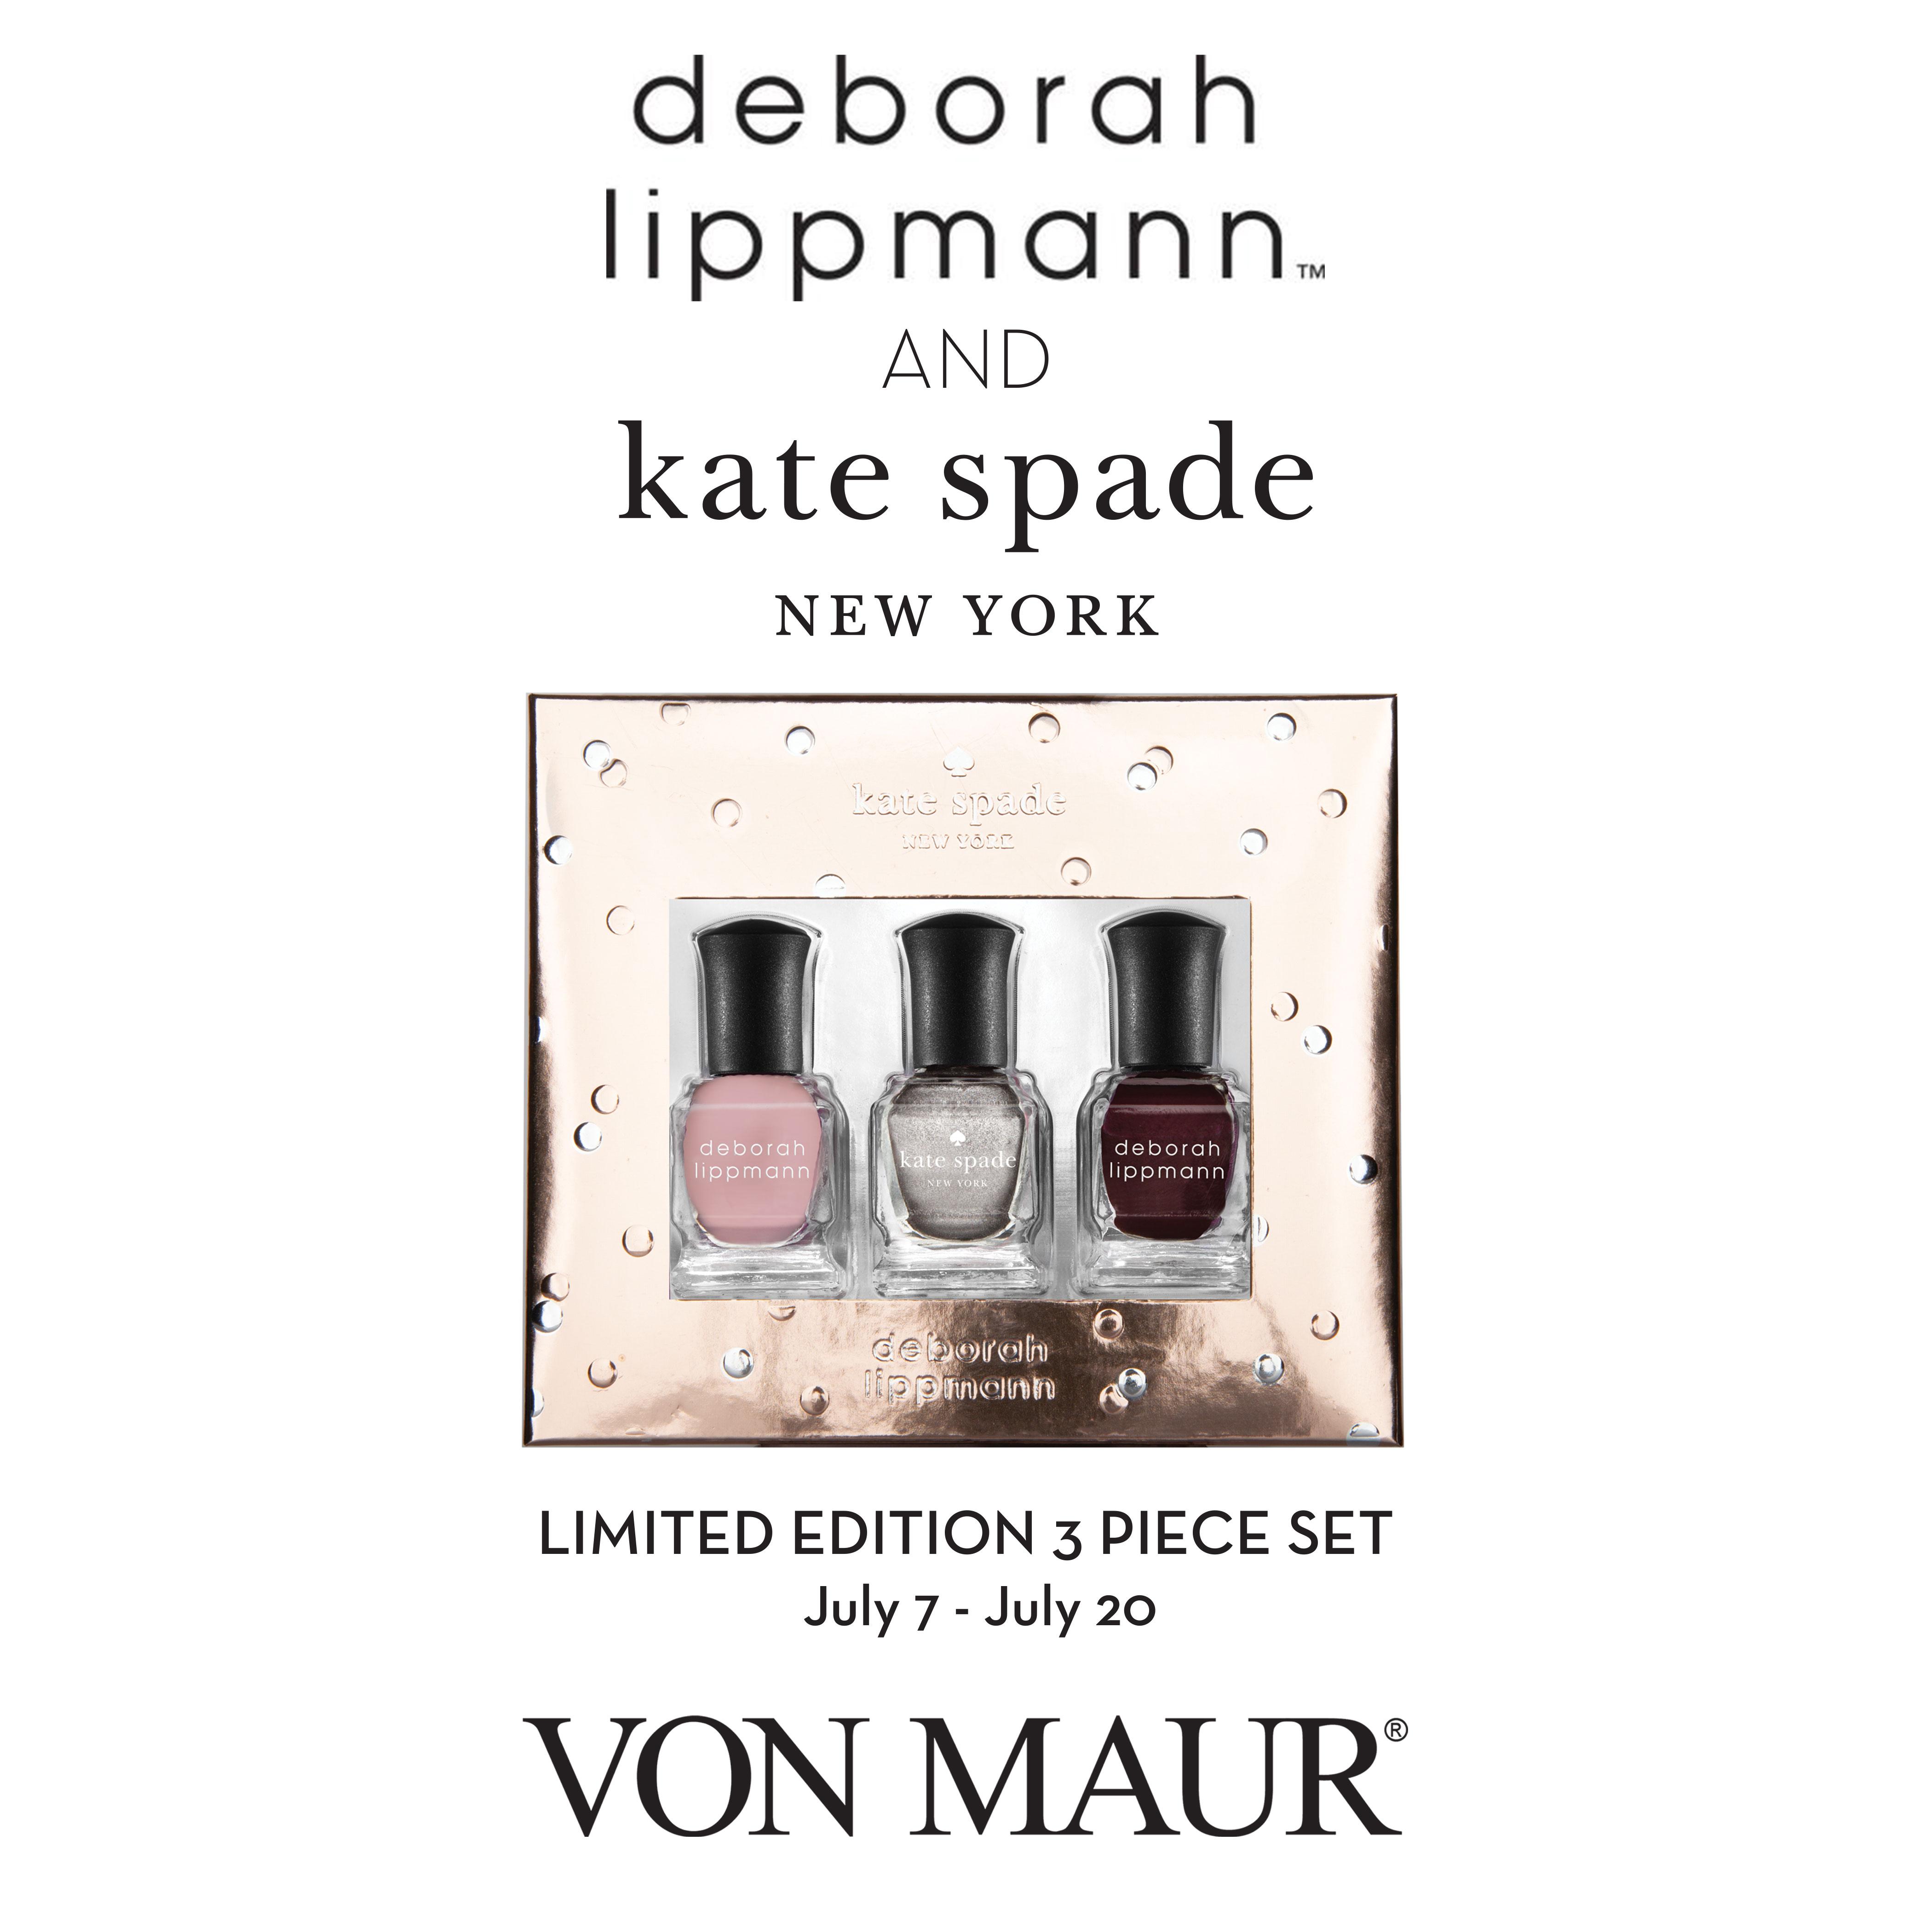 Free Deborah Lippmann Gift with Purchase